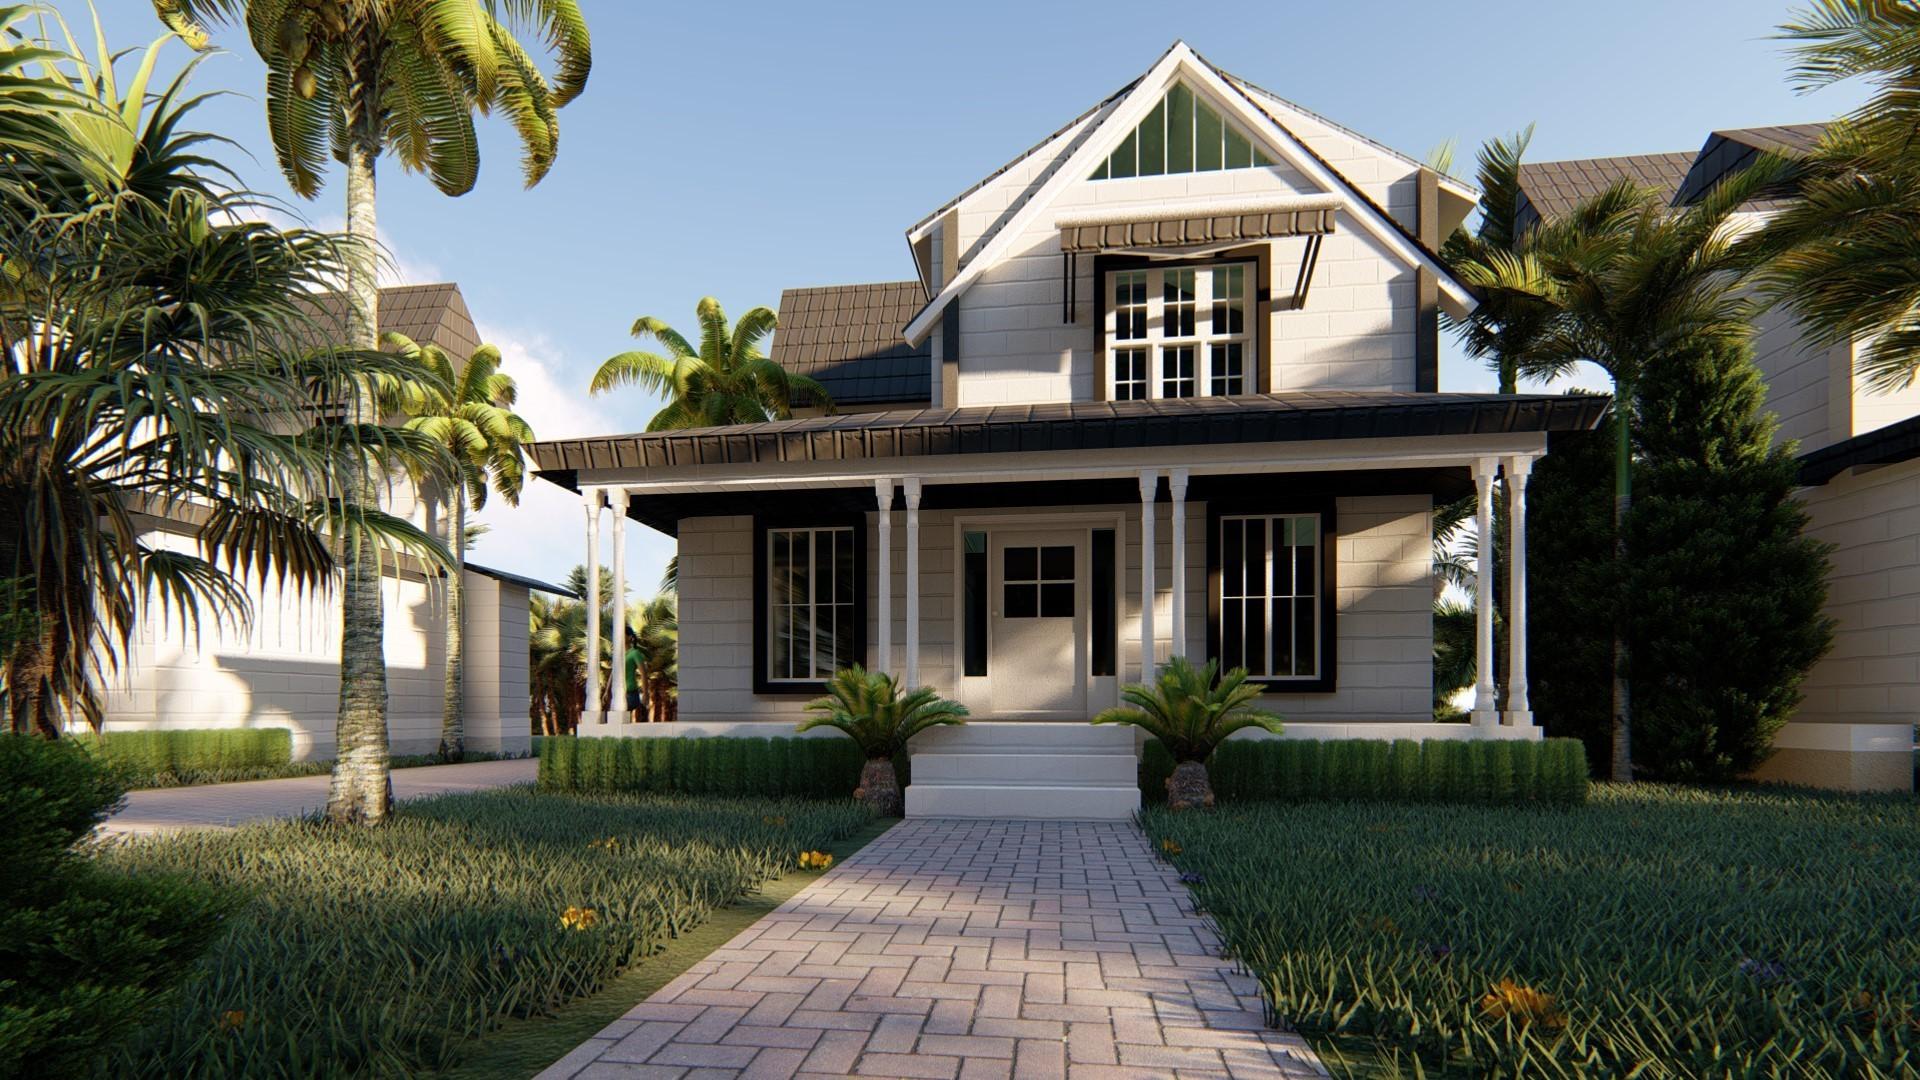 Peachy Homes For Rent Auburn Alabama 360 Management Download Free Architecture Designs Rallybritishbridgeorg